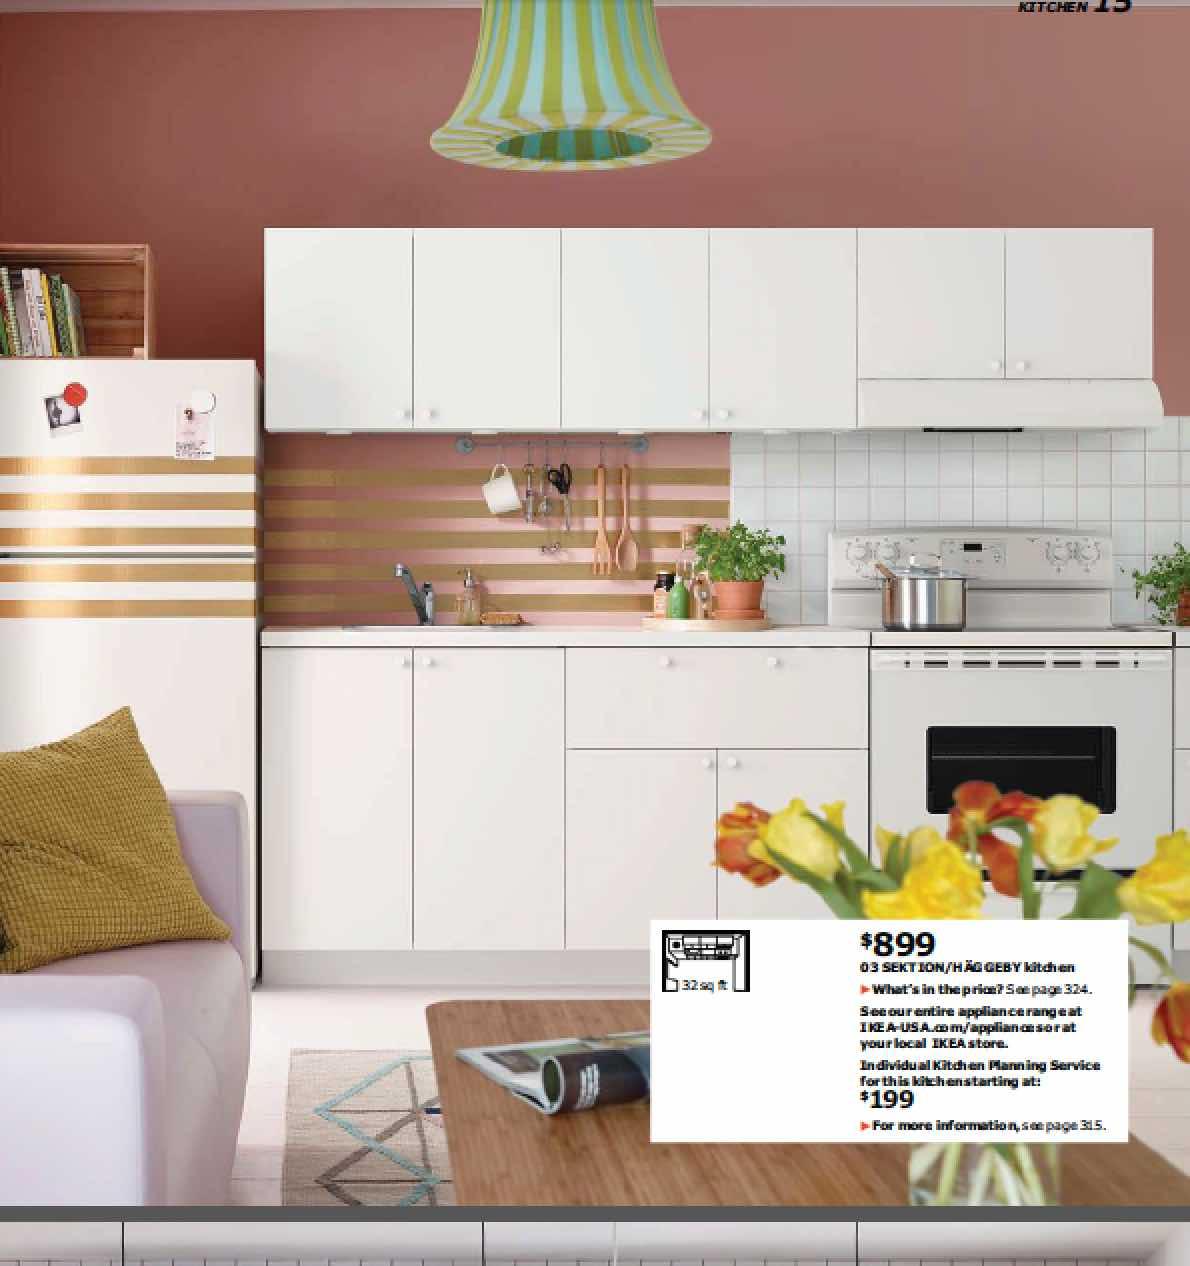 Ikea Faktum Zur Zeit Nicht Lieferbar ~ ll start from the kitchen and dining sections and work my way